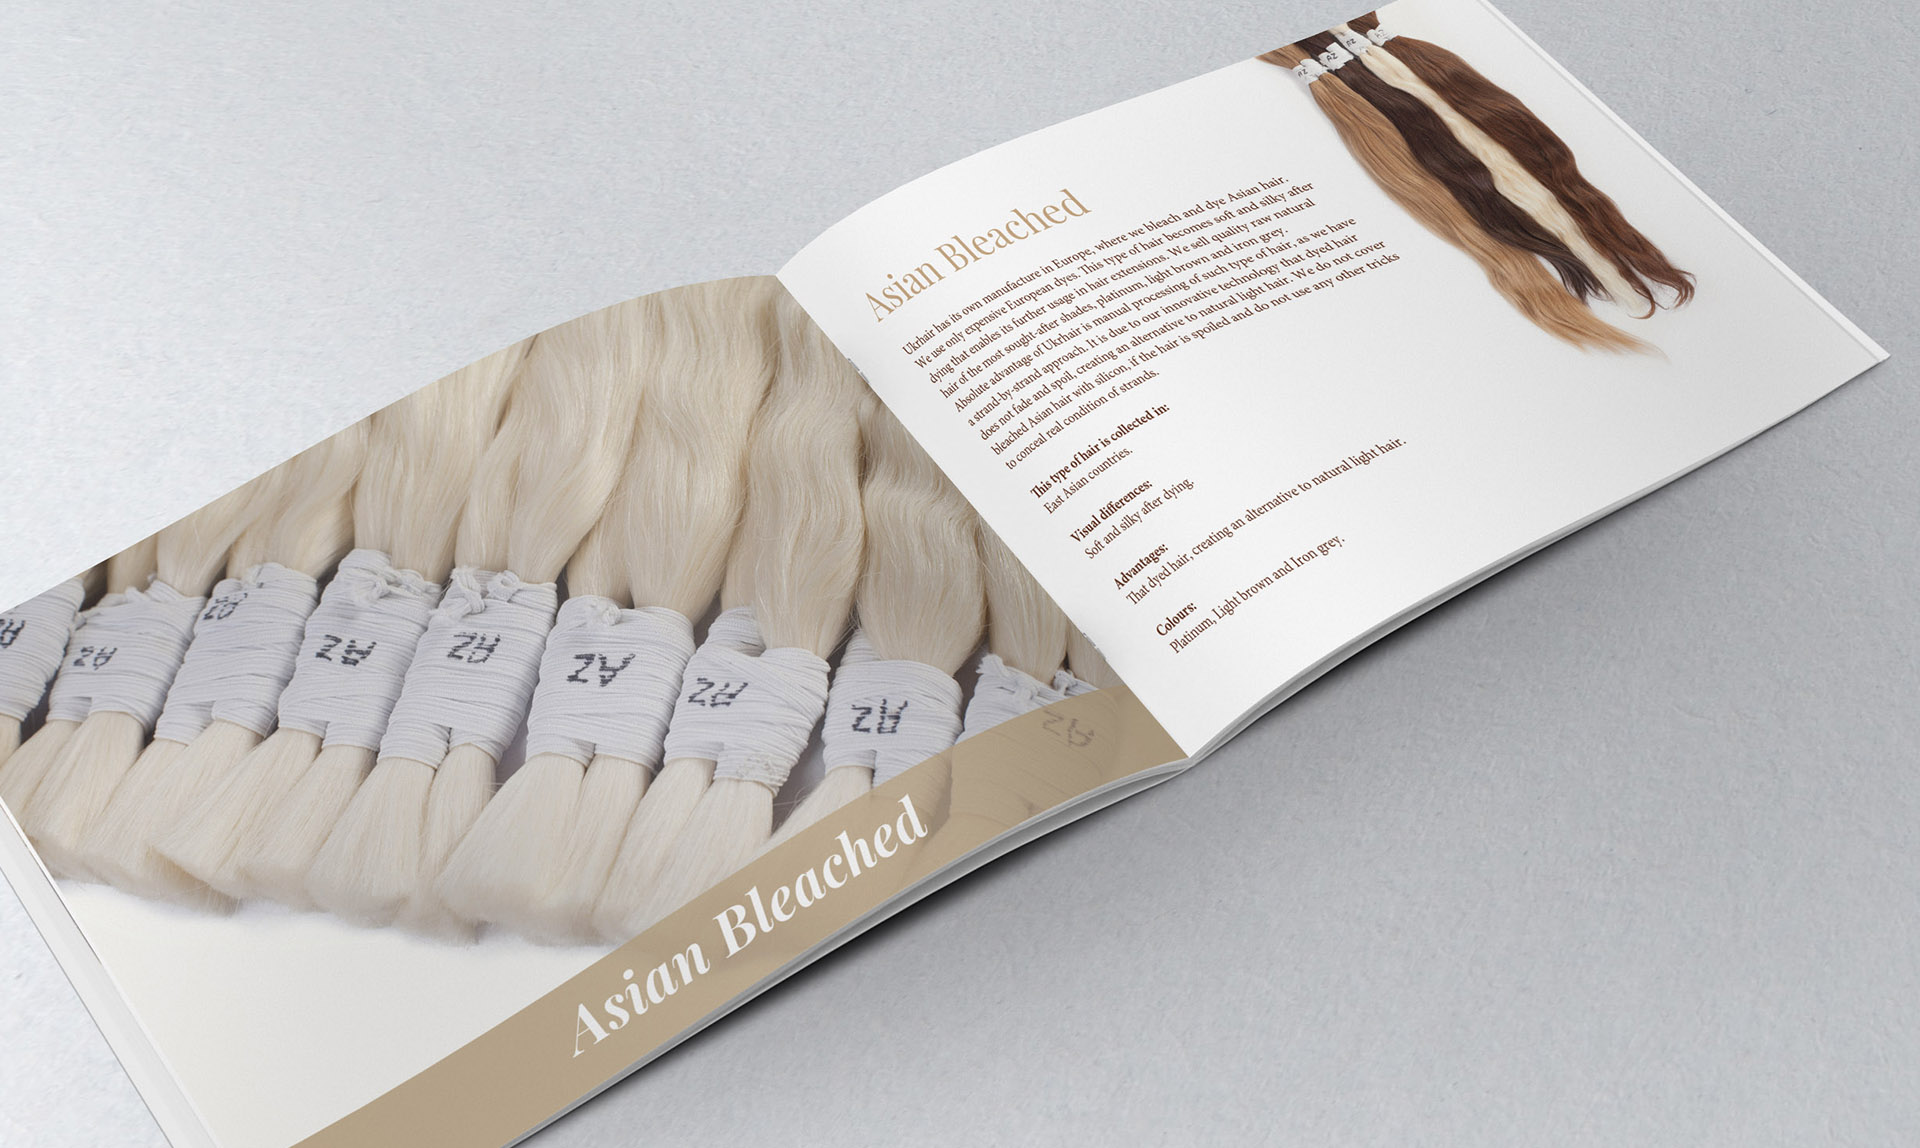 Development дизайна каталога для волос